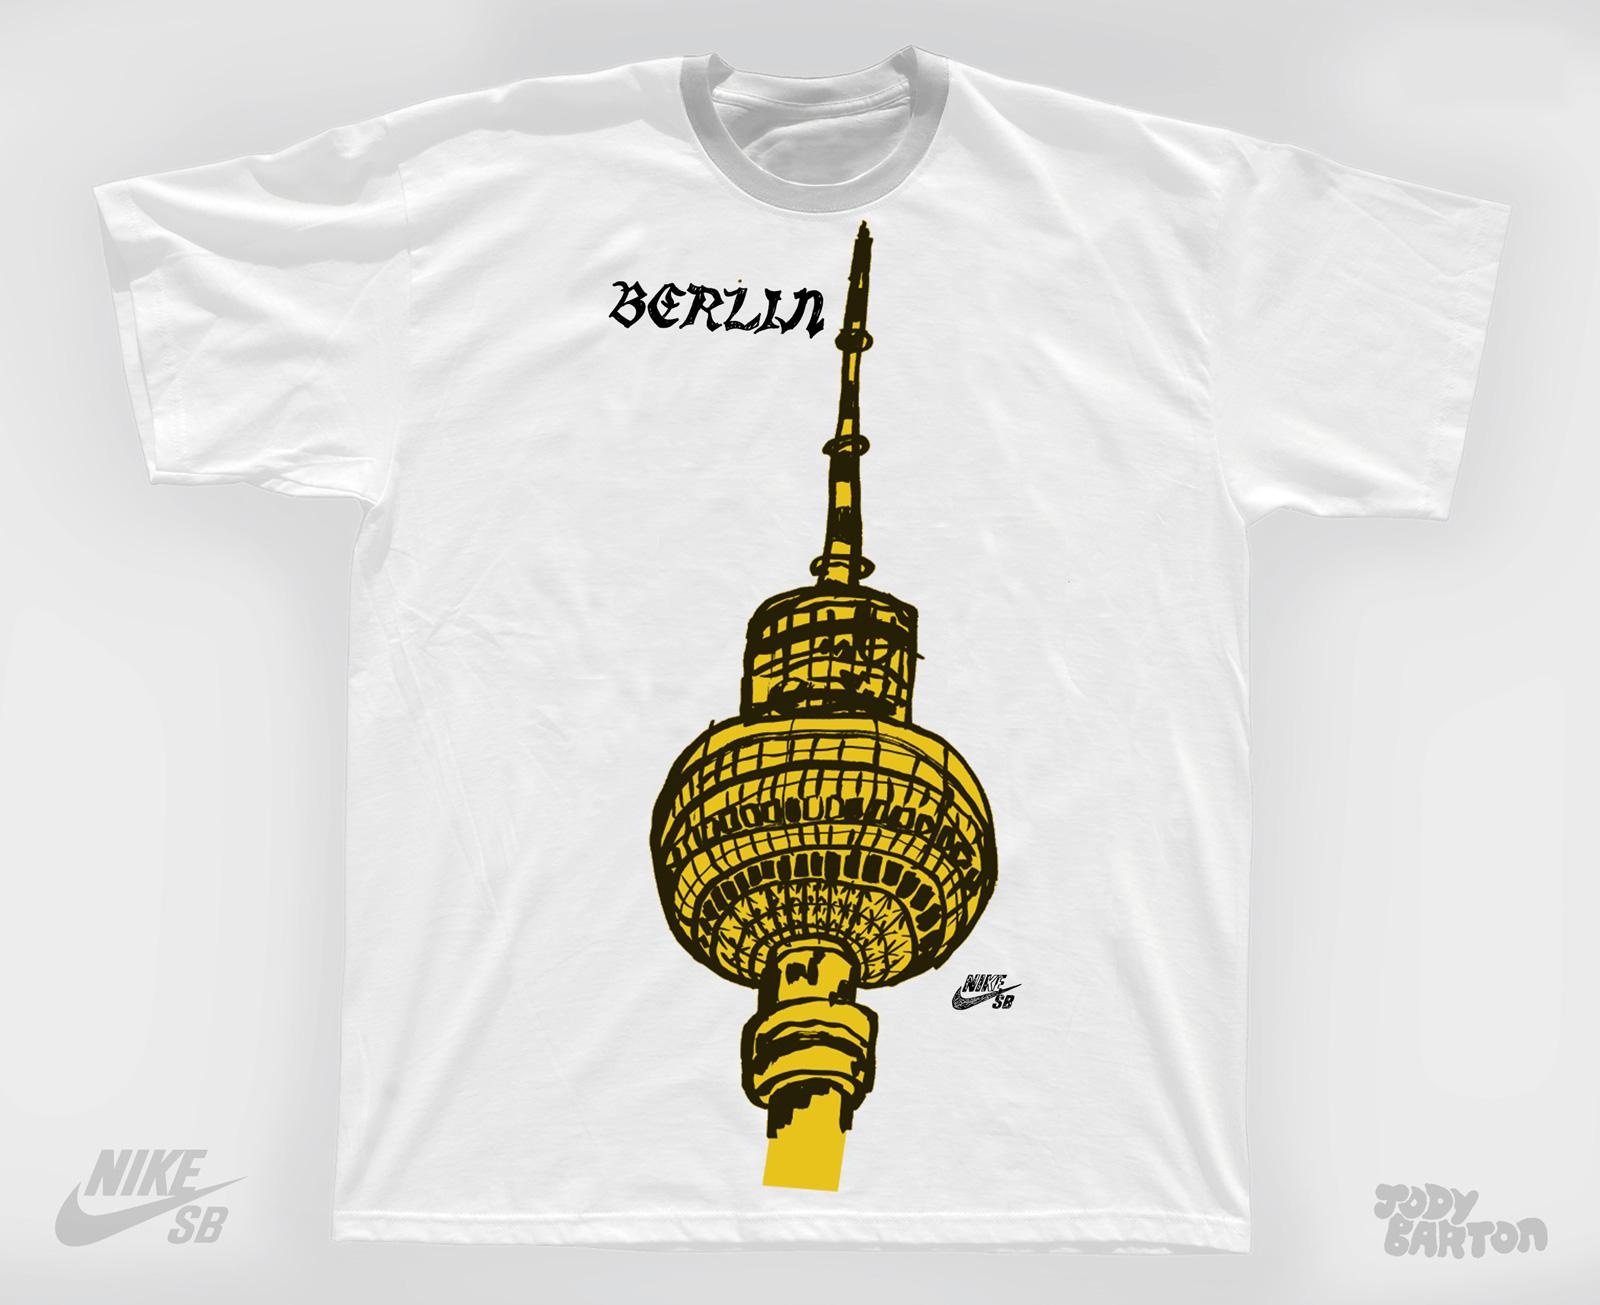 Nike-Skate-T-BERLIN-06